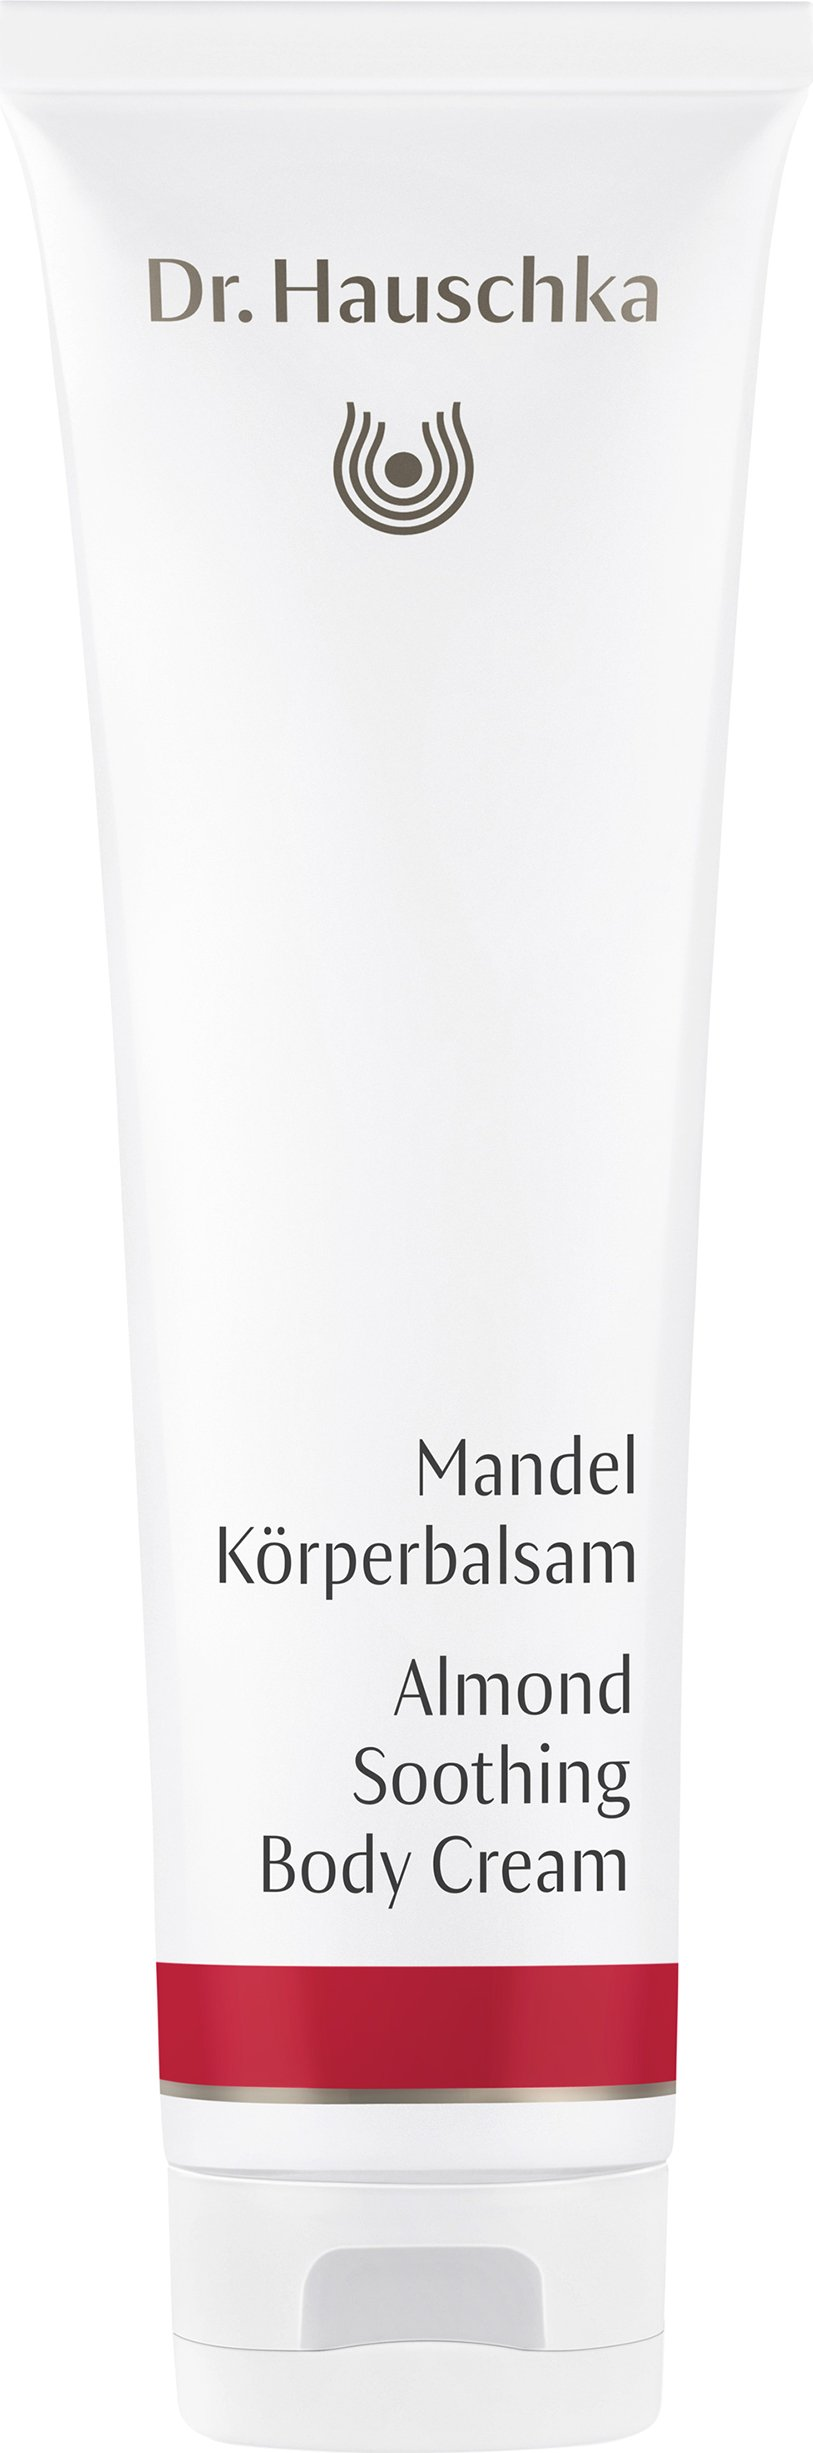 Dr. Hauschka - Almond Soothing Body Cream 145 ml